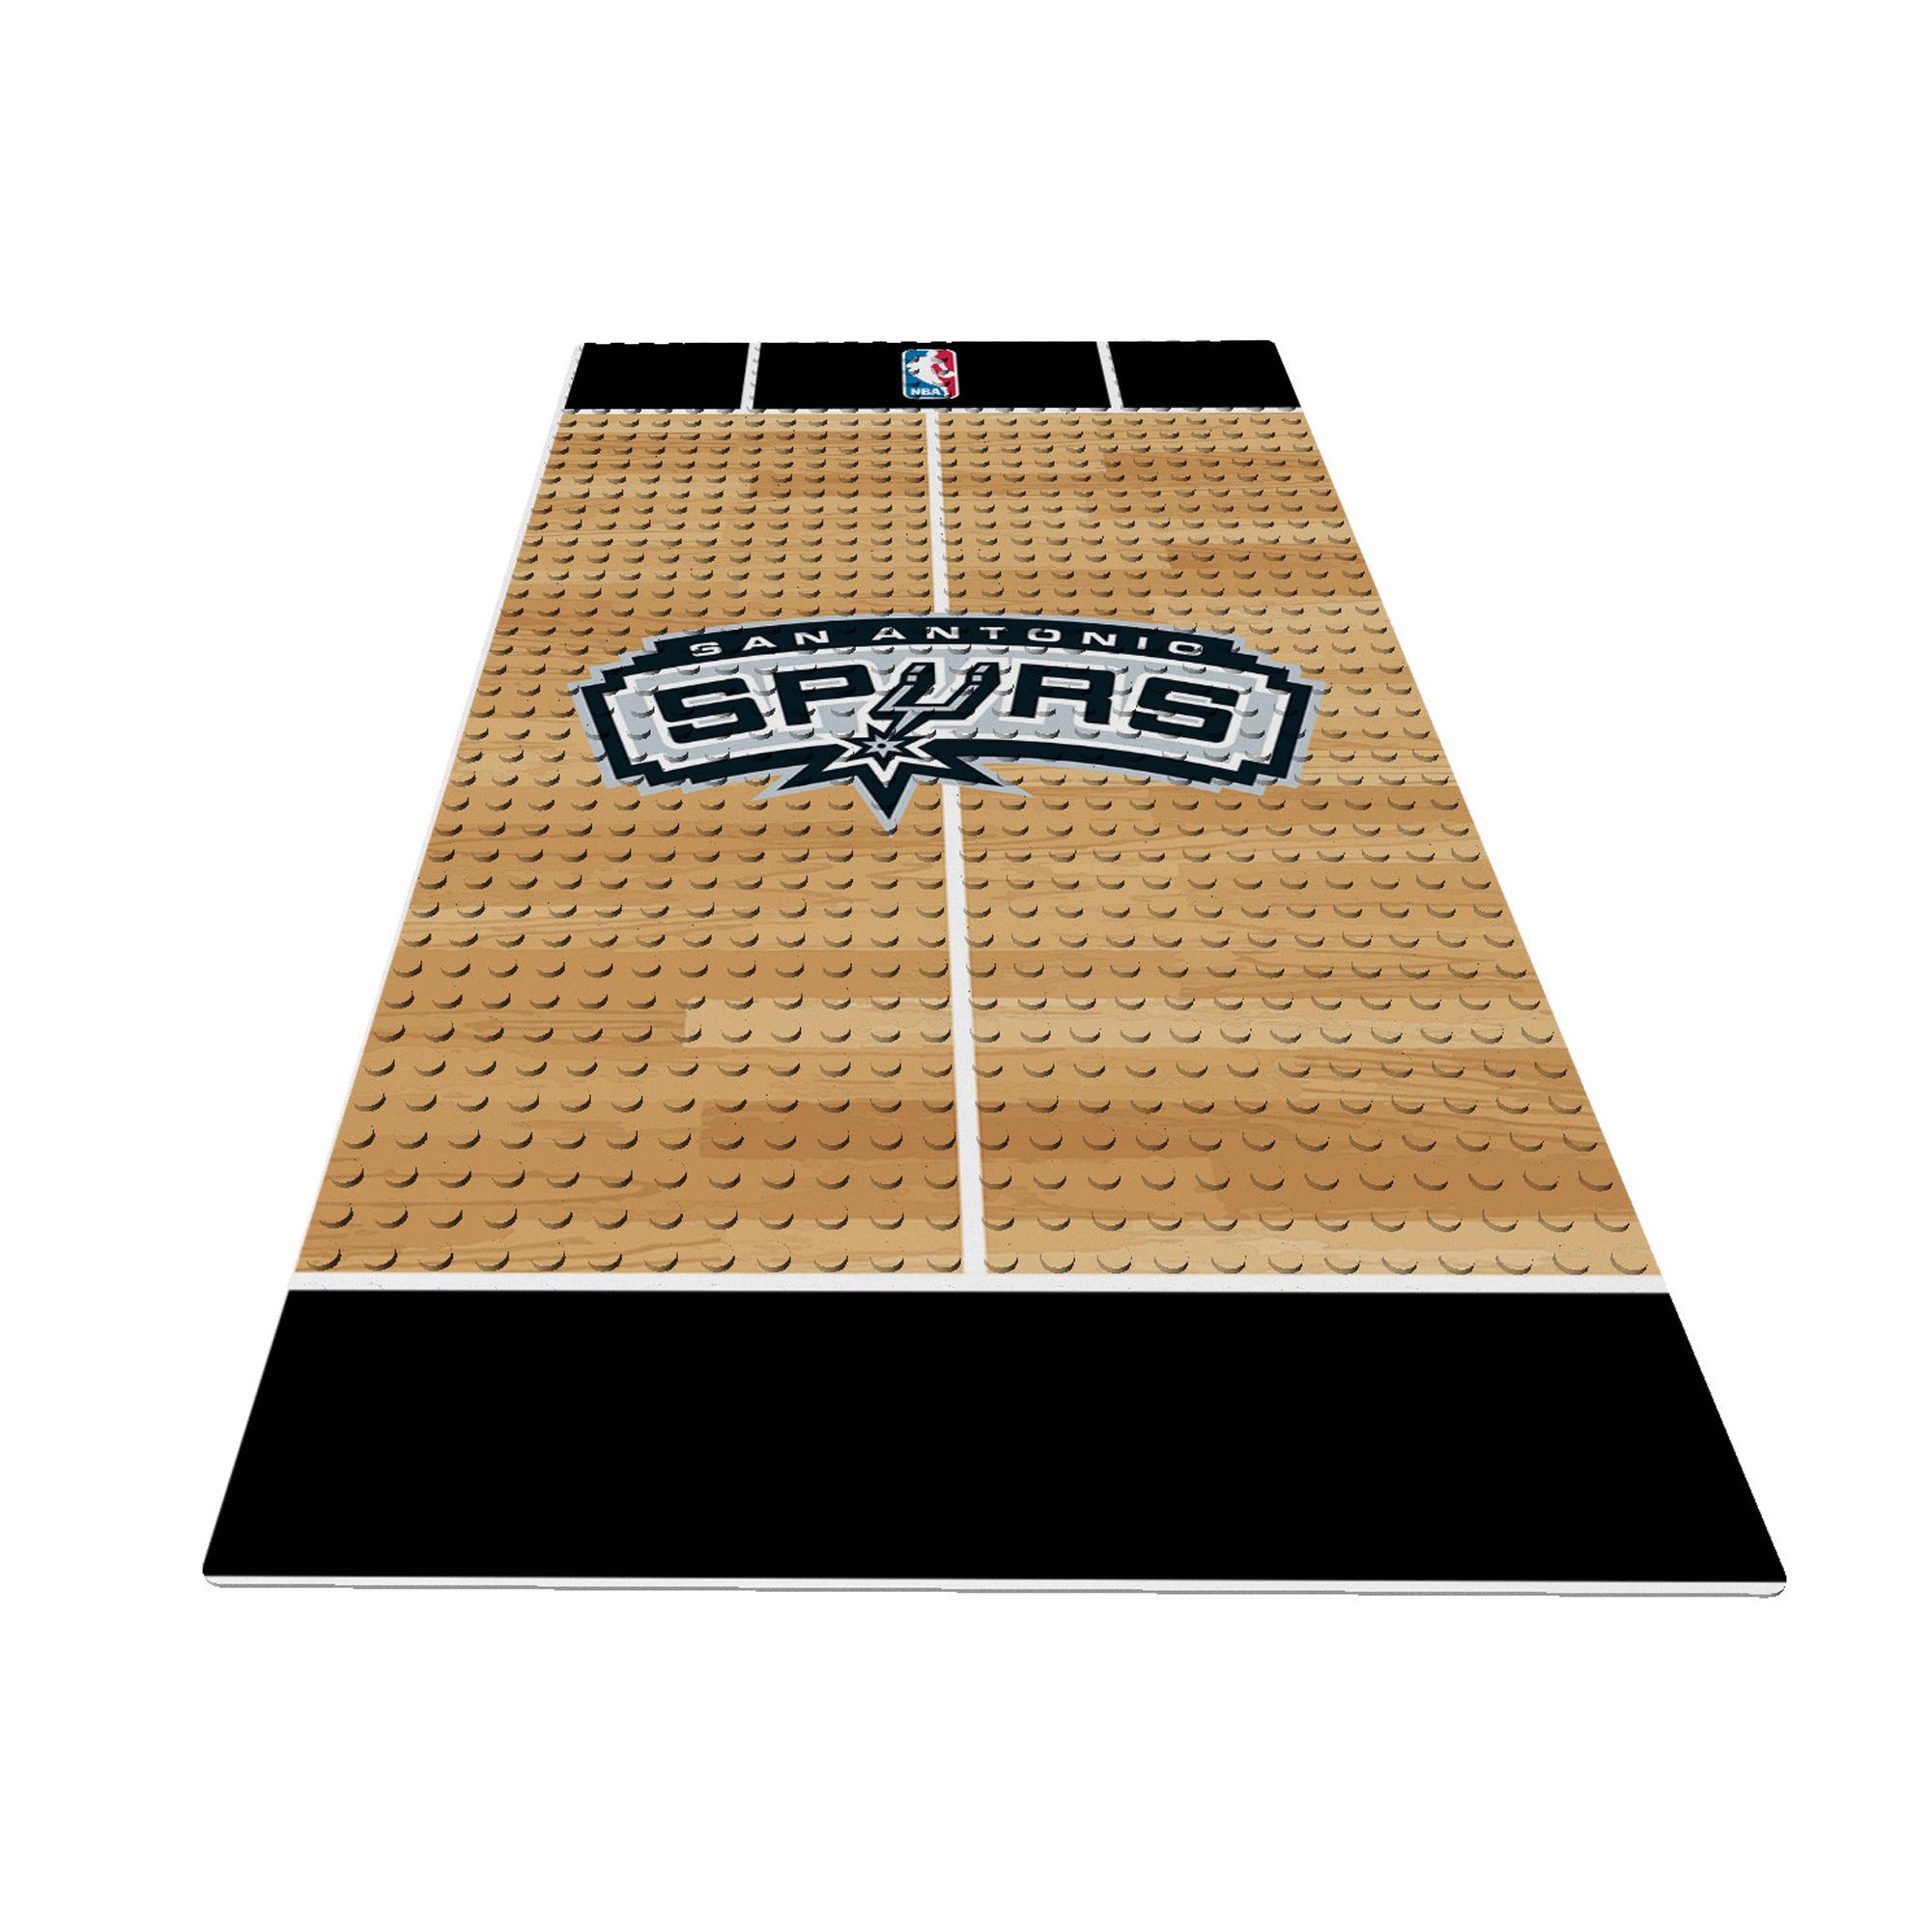 San Antonio Spurs OYO Sports Display Plate - No Size